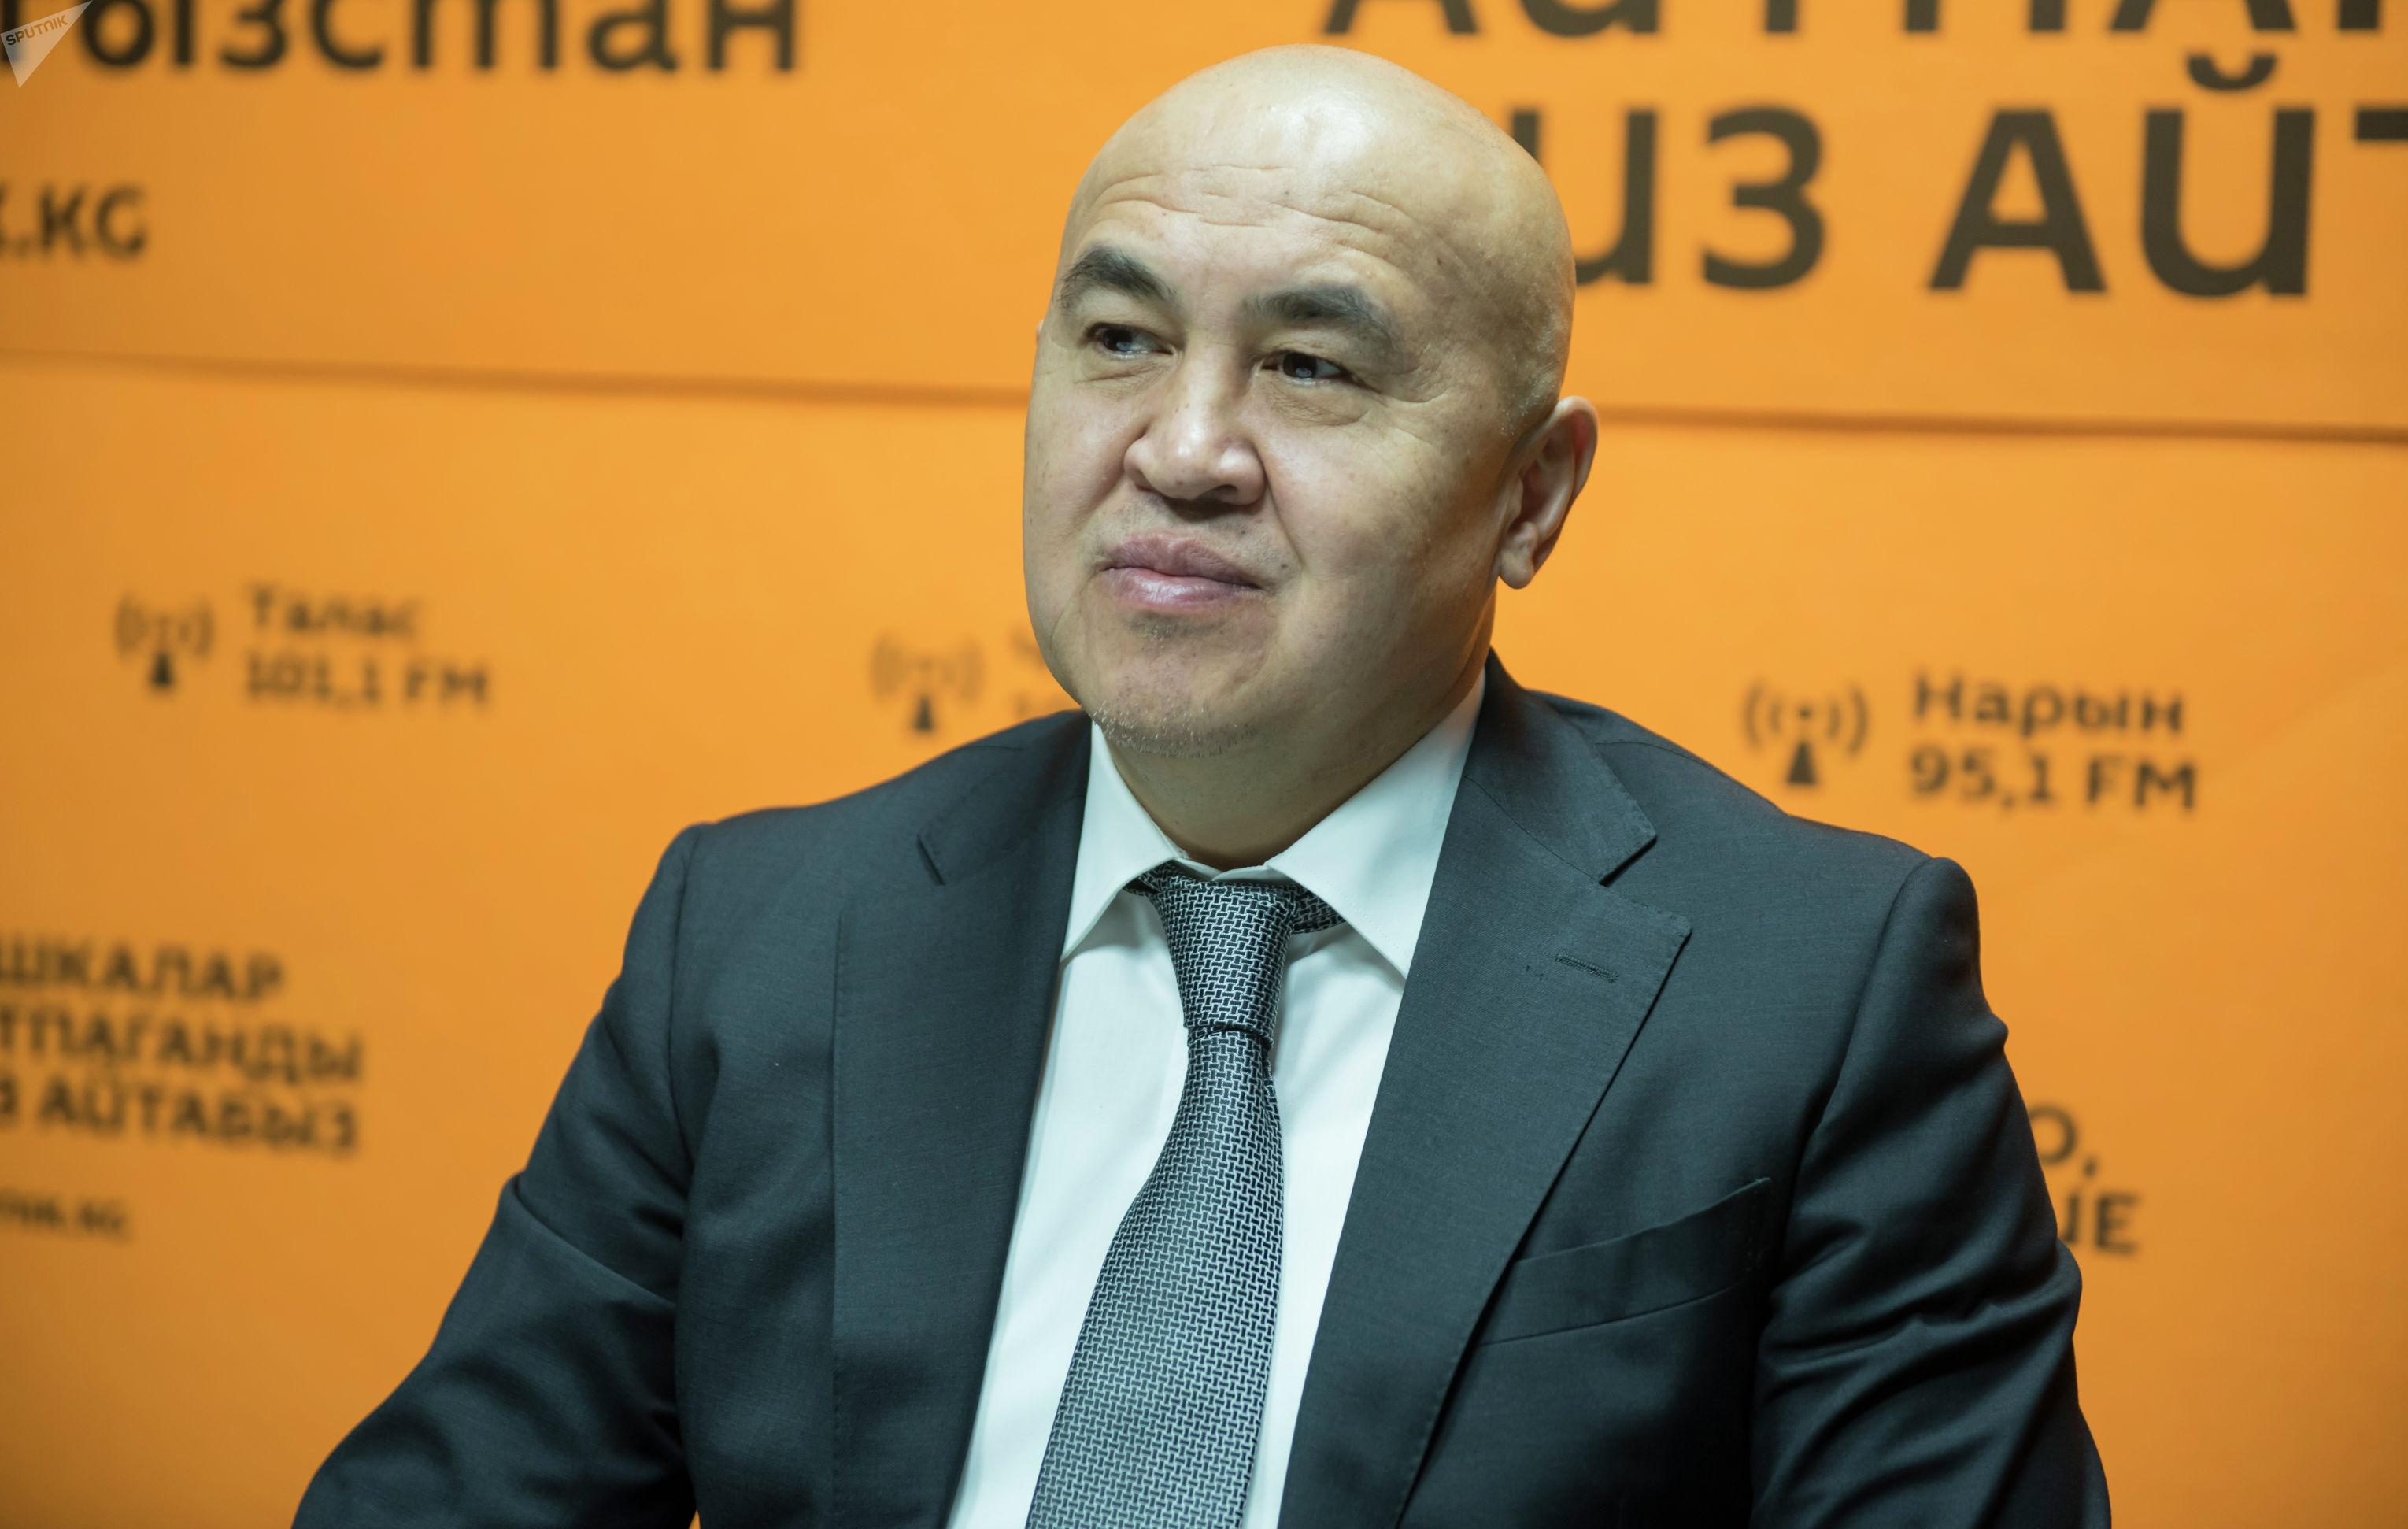 Депутат ЖК, лидер фракции Бир Бол Алтынбек Сулайманов на радиостудии Sputnik Кыргызстан